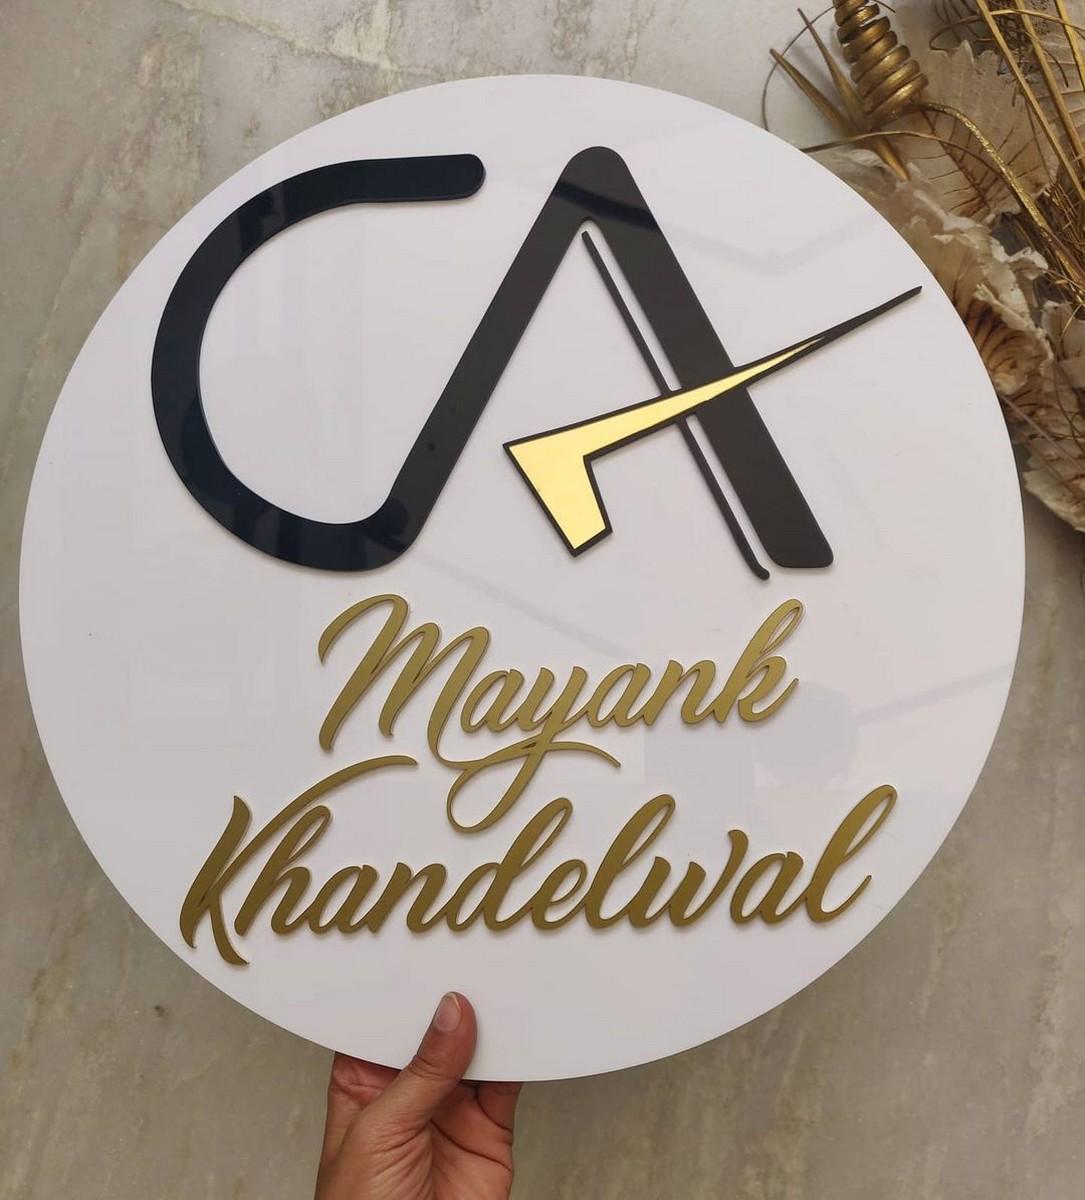 Customizable Acrylic Name Plate For Chartered Accountant  Acrylic Name Plate